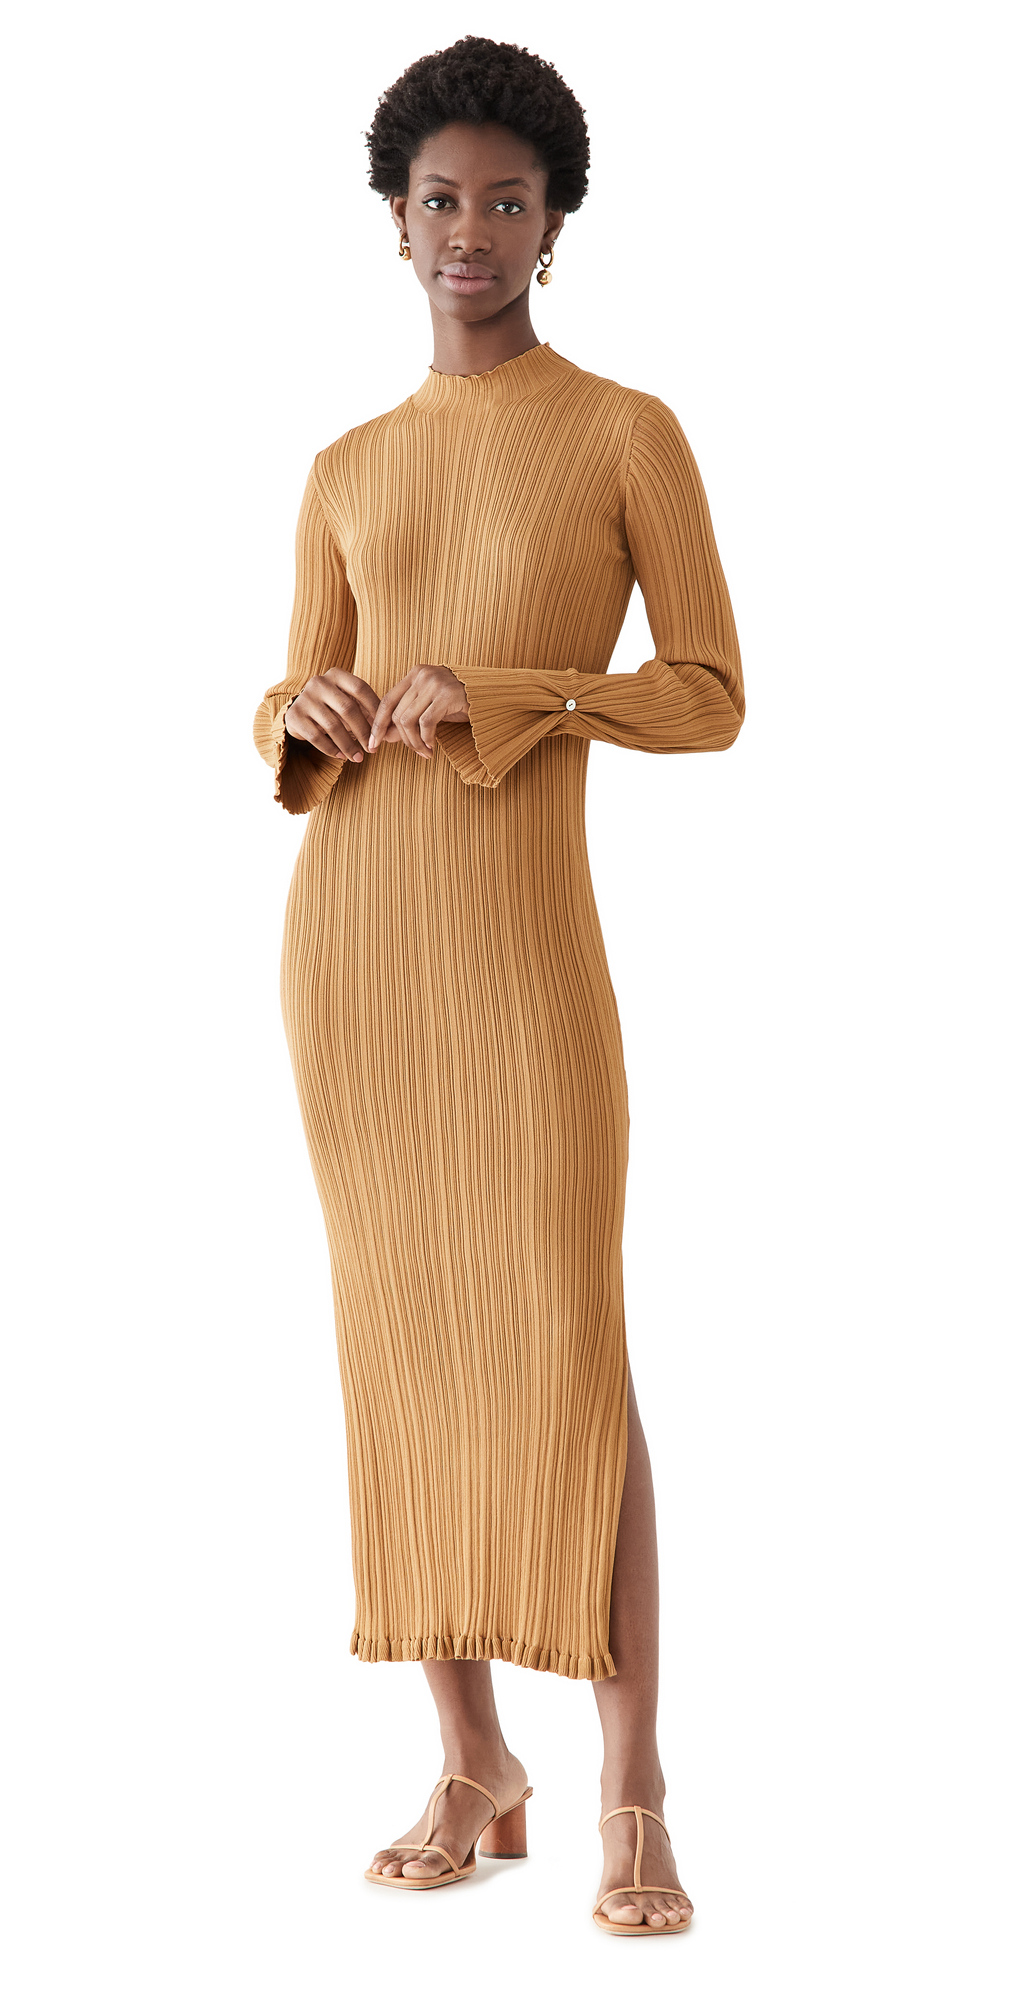 Hadeland Knit Dress